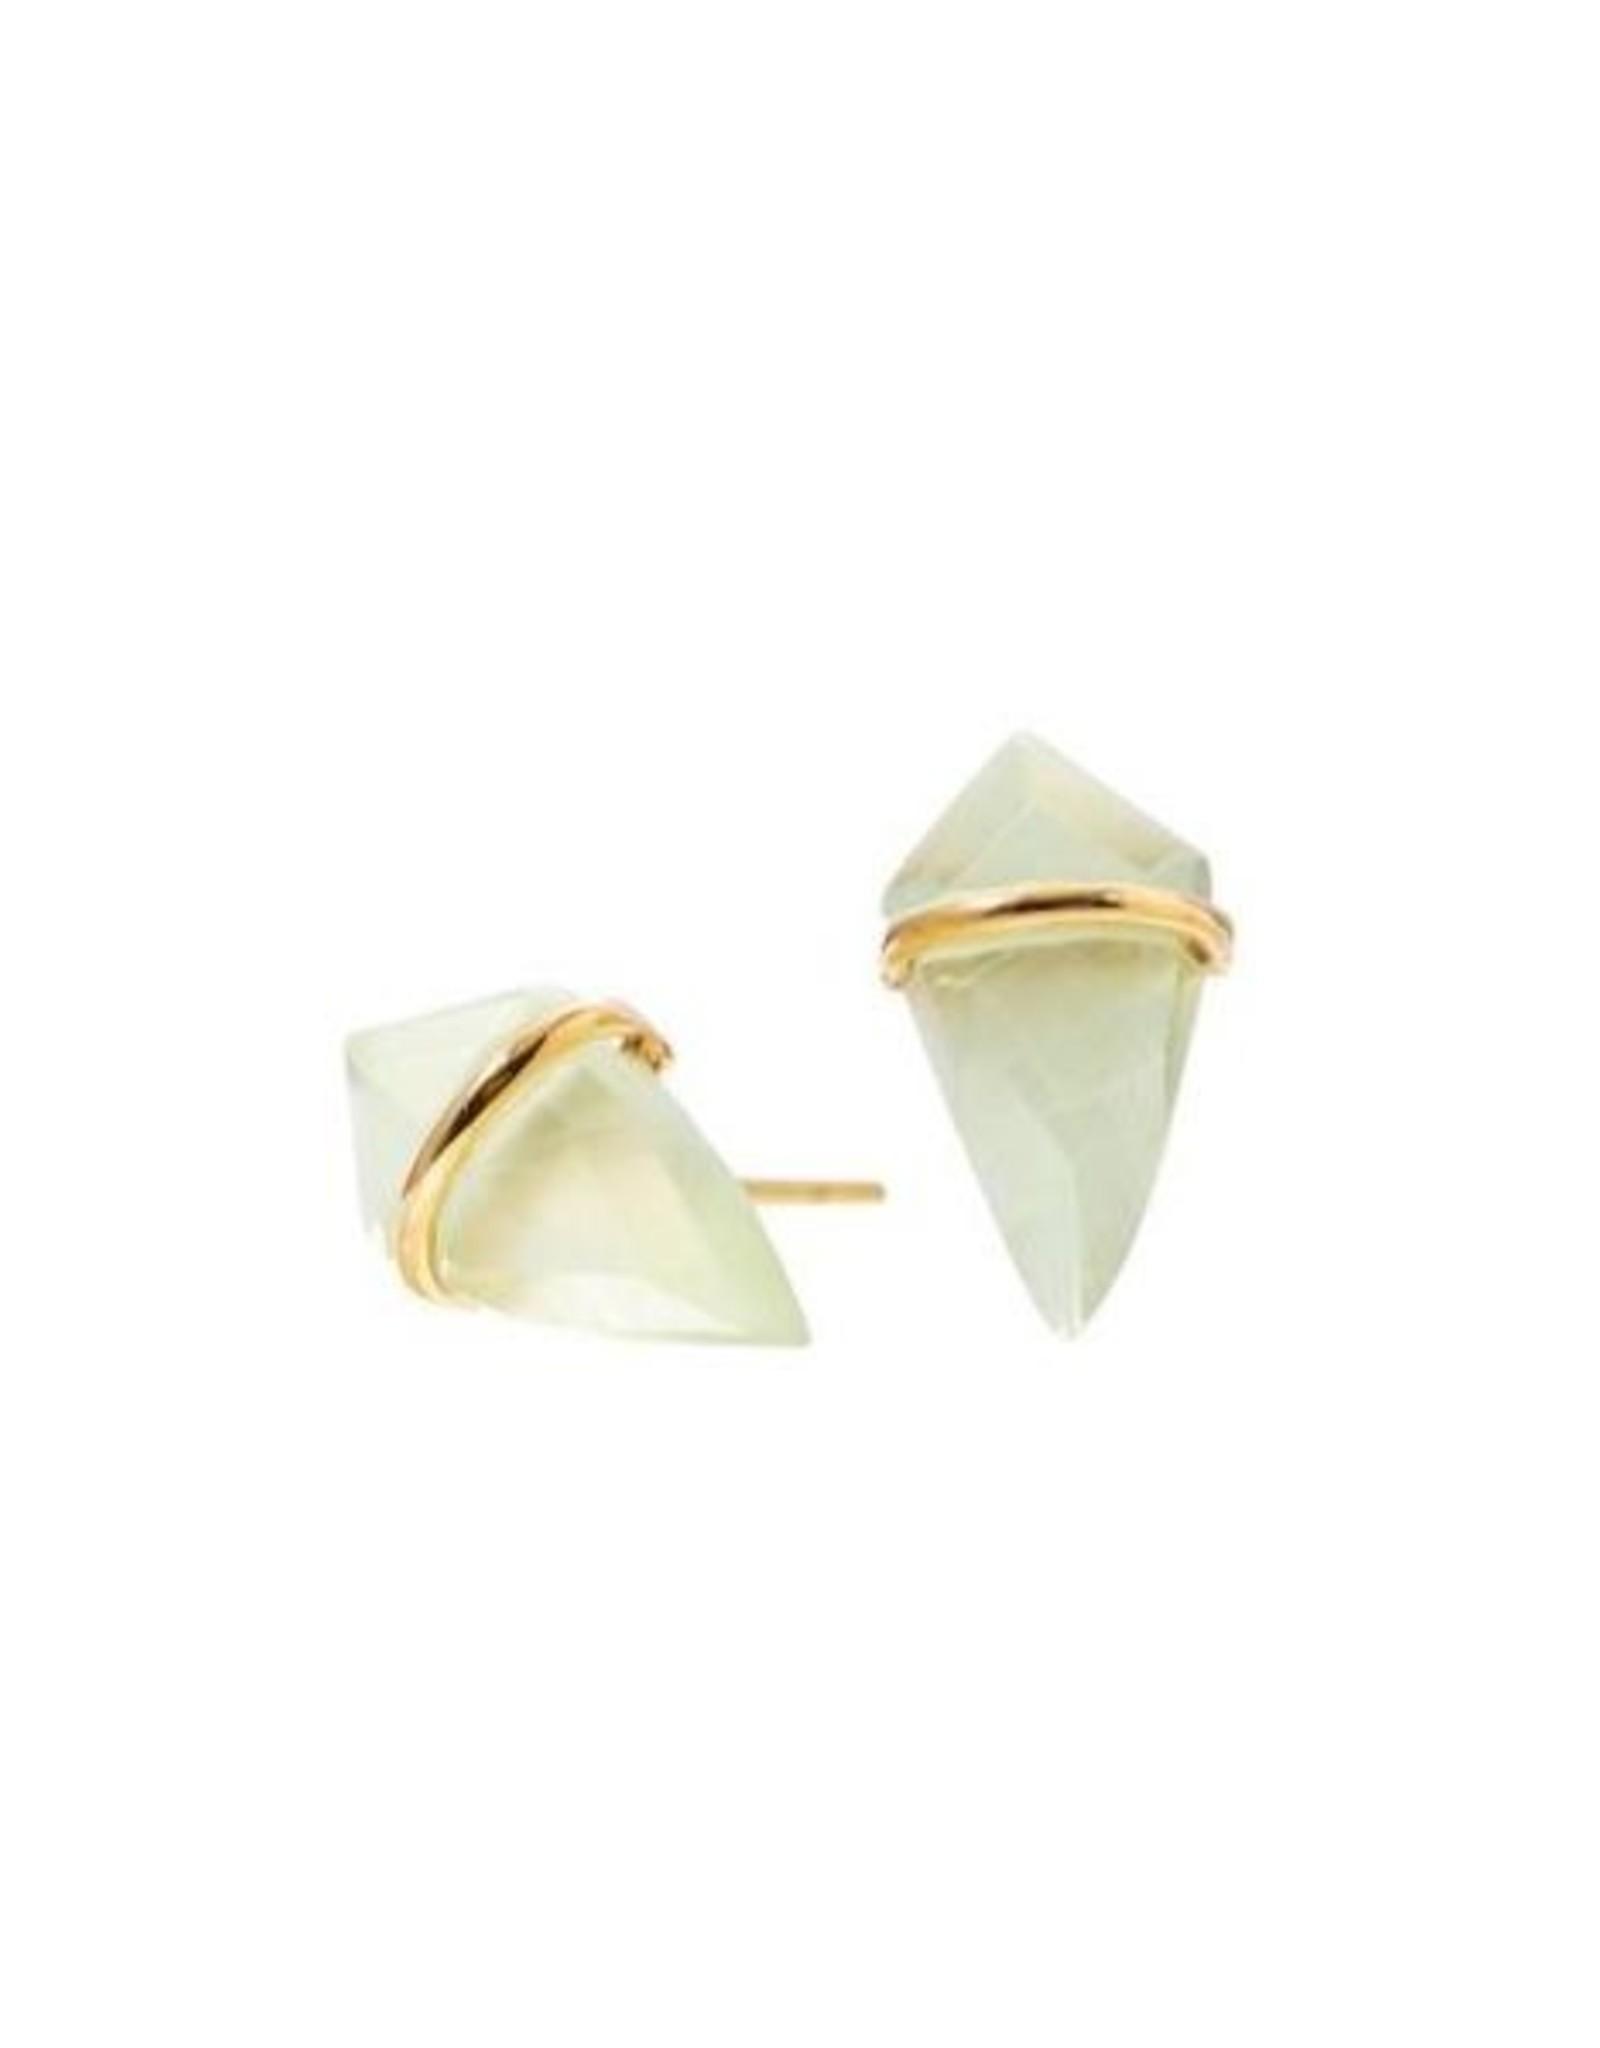 Page Sargisson Kite Earrings - 18k